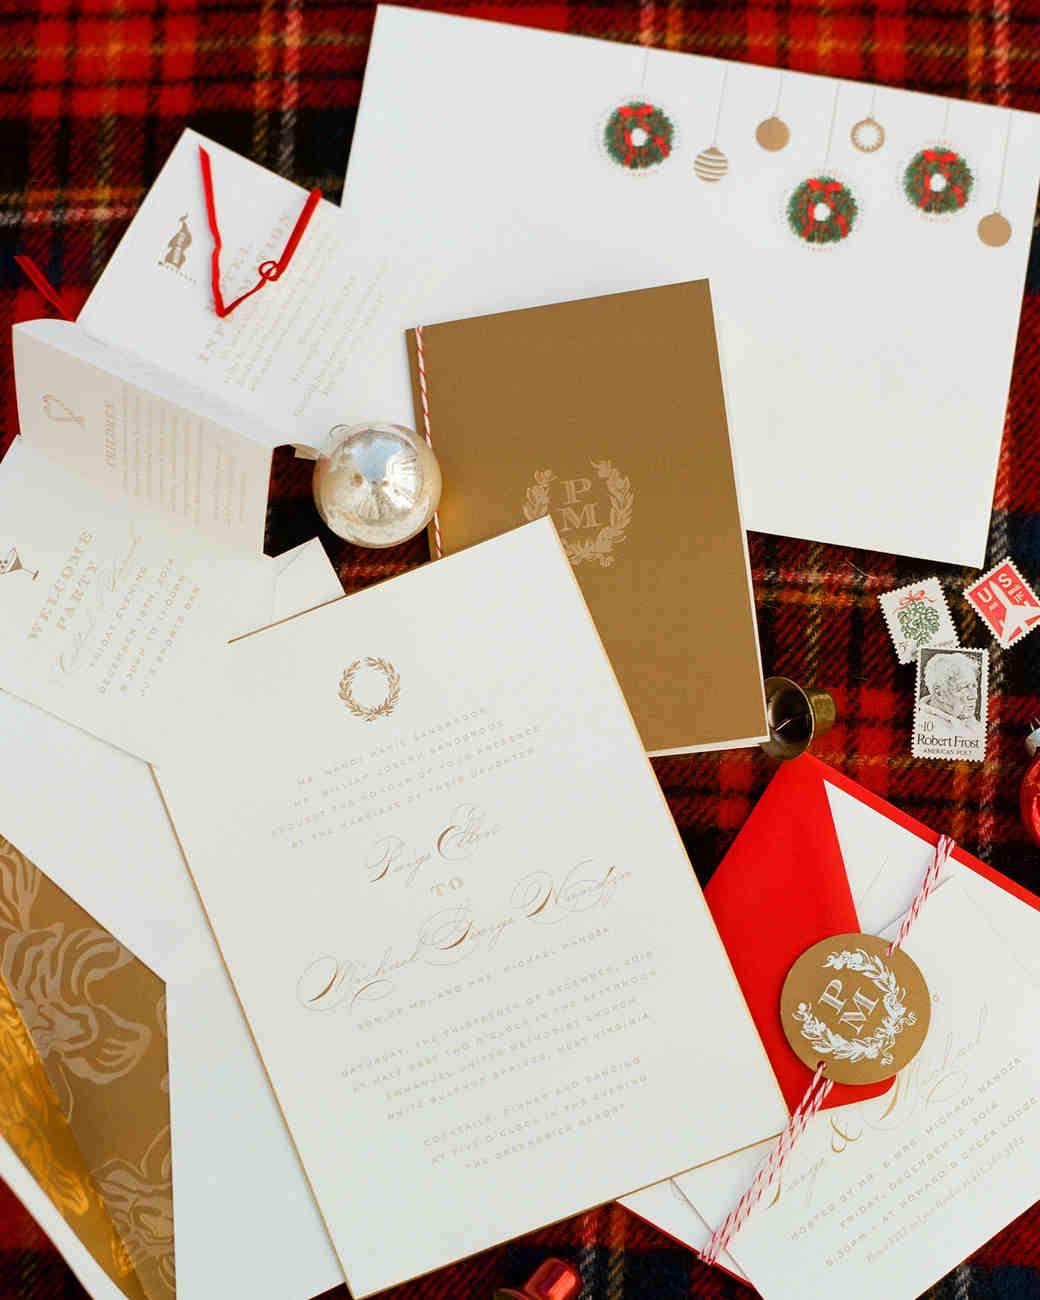 paige-michael-wedding-invite-0054-s112431-1215.jpg